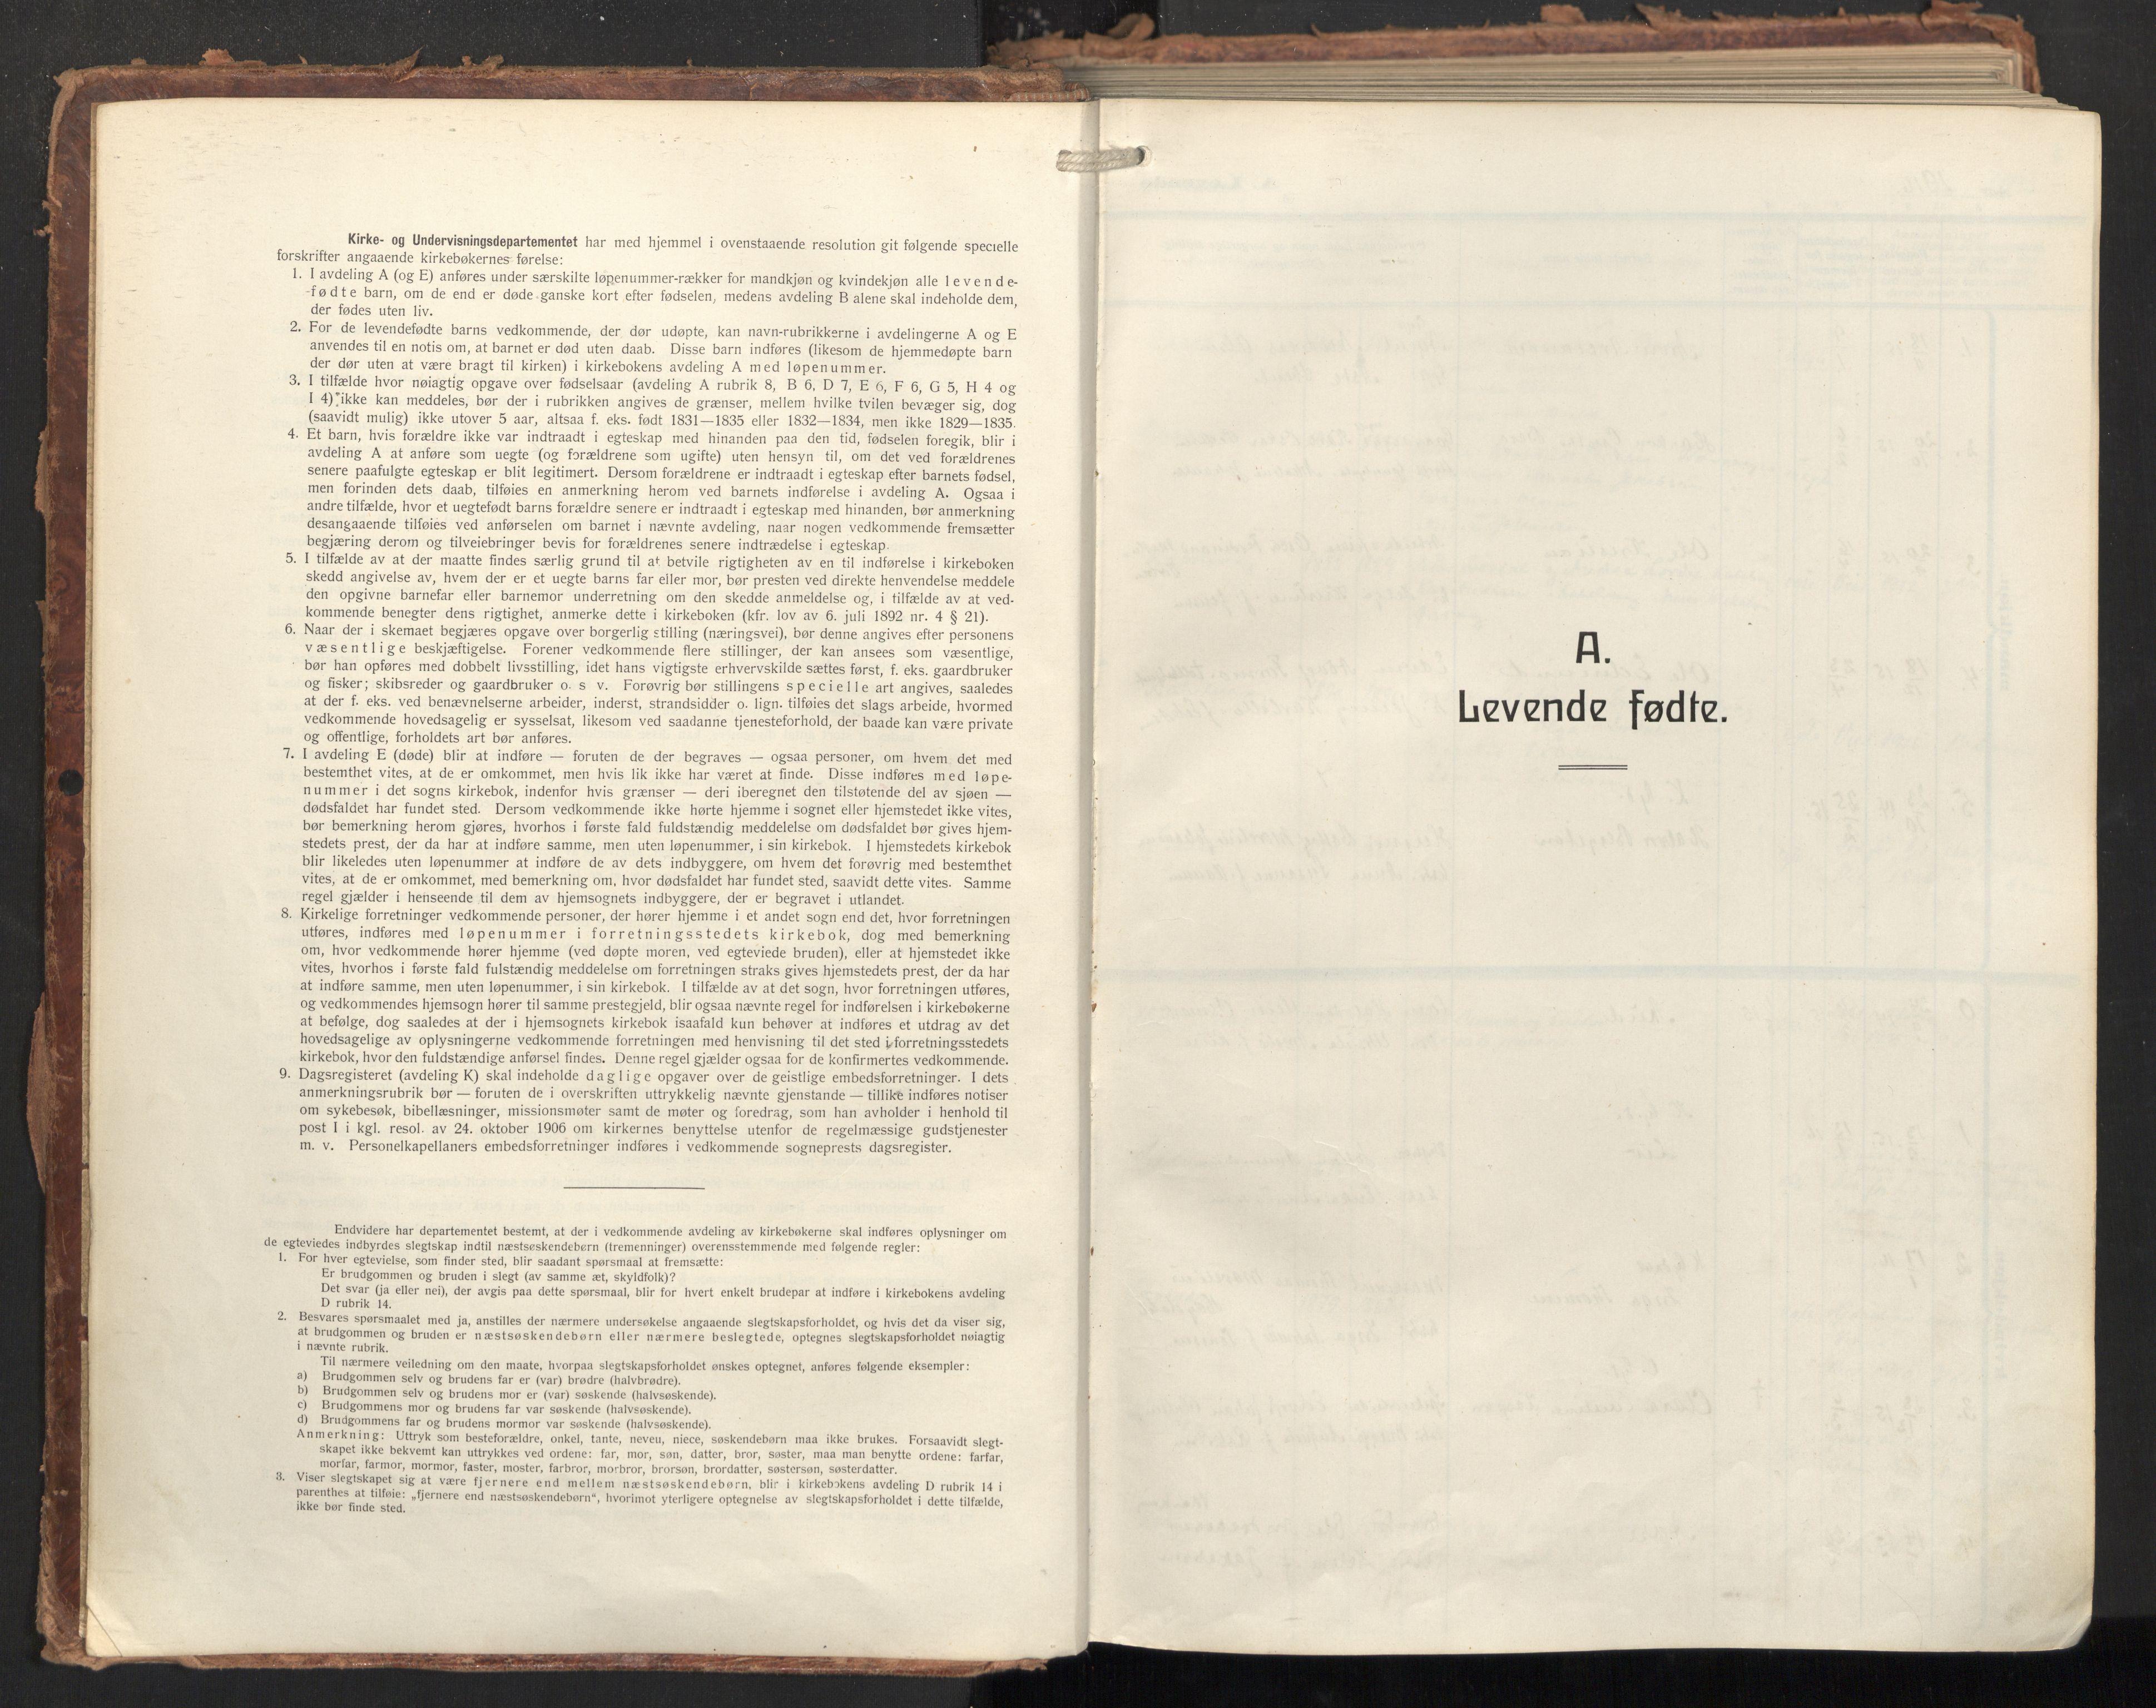 SAT, Ministerialprotokoller, klokkerbøker og fødselsregistre - Nordland, 874/L1064: Ministerialbok nr. 874A08, 1915-1926